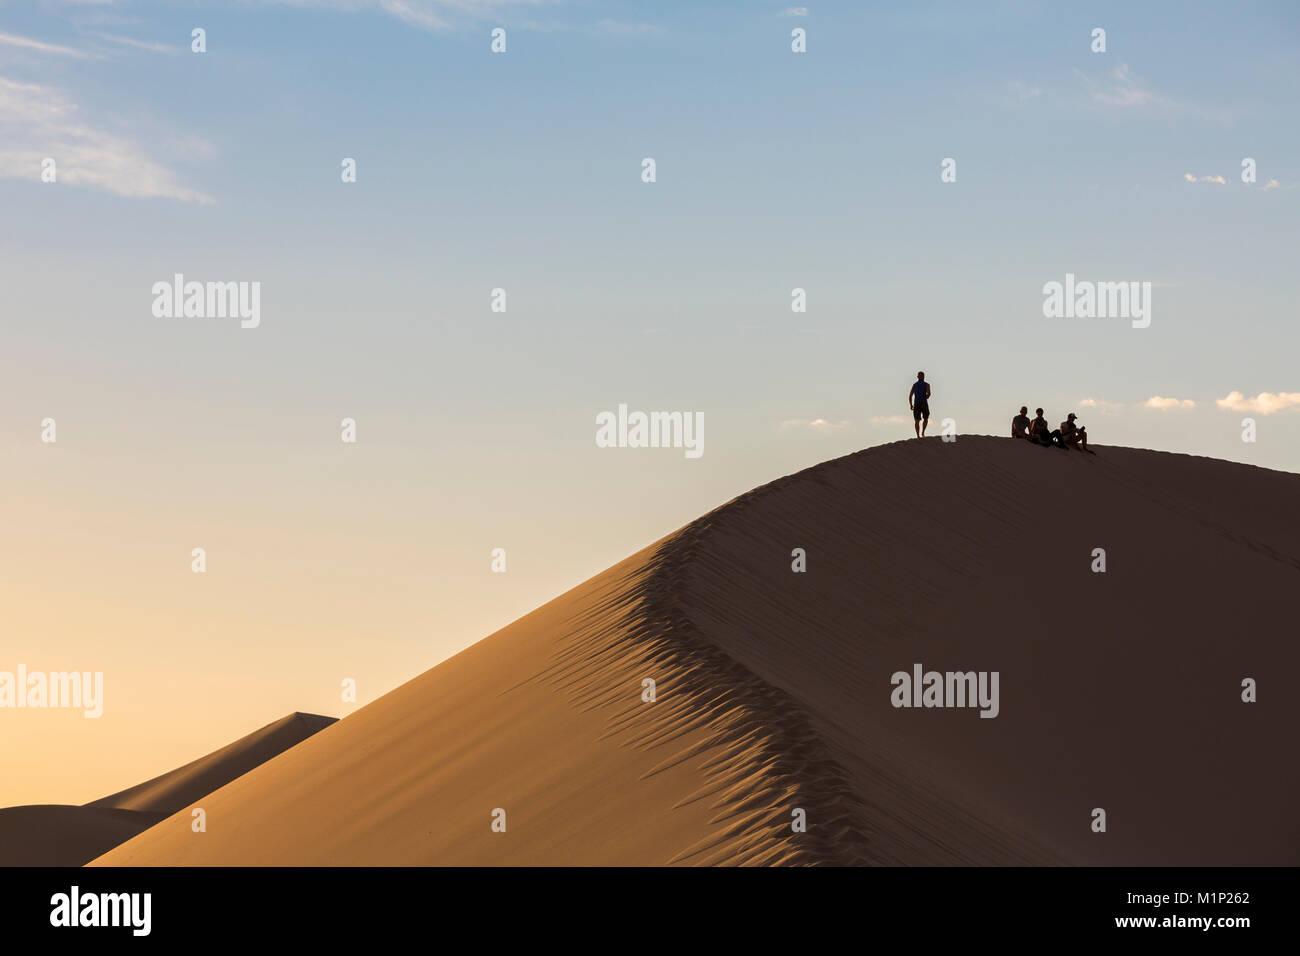 Menschen in Silhouette auf Khongor Sanddünen in der Wüste Gobi Gurvan Saikhan Nationalpark, Sevrei Bezirk, Stockbild